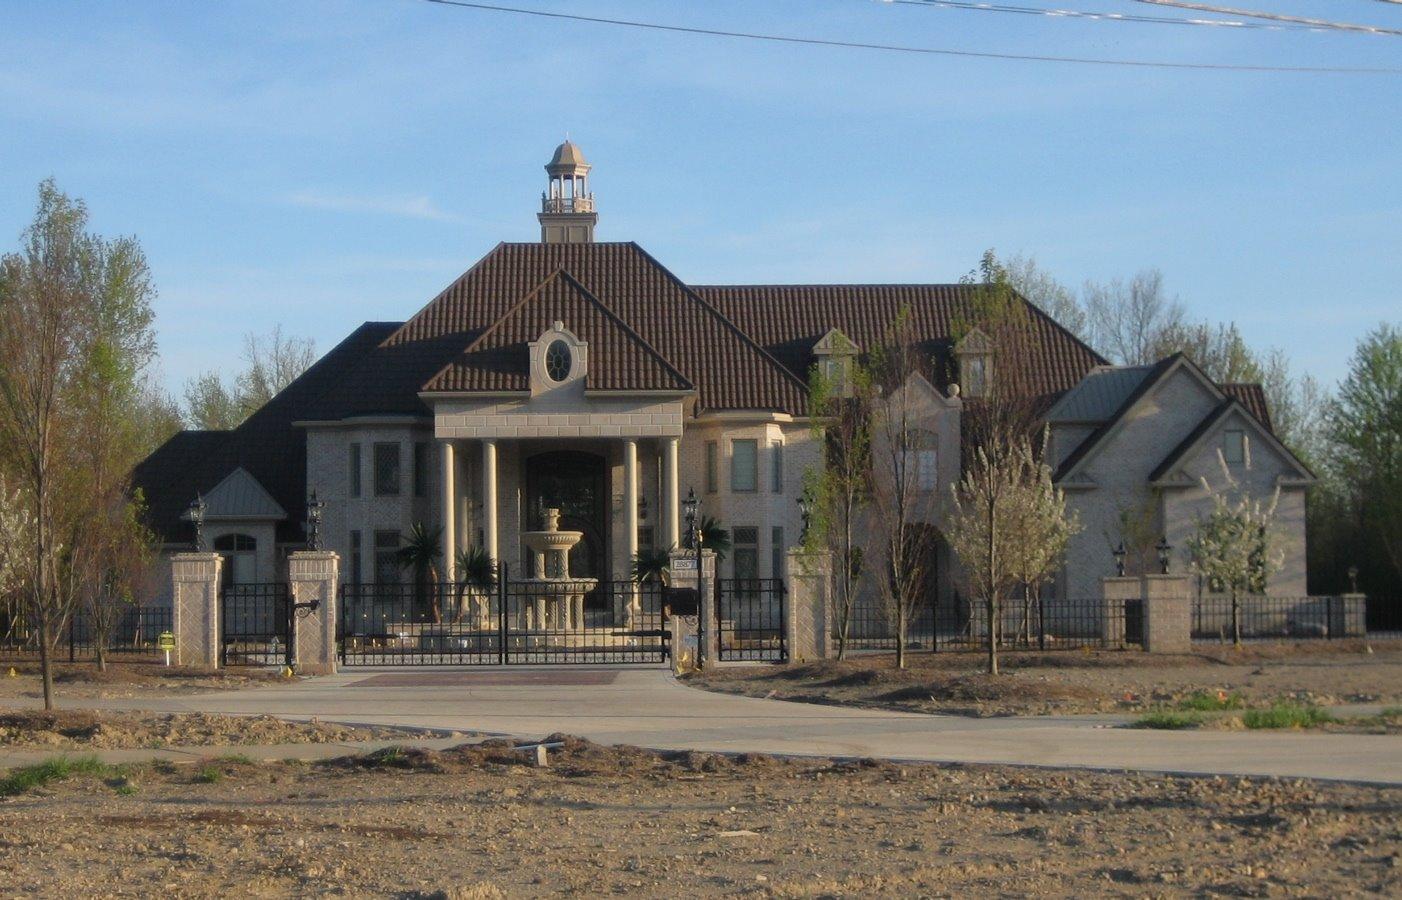 Checkout this altoghether rad bad boy mansion my bae went crazy :)